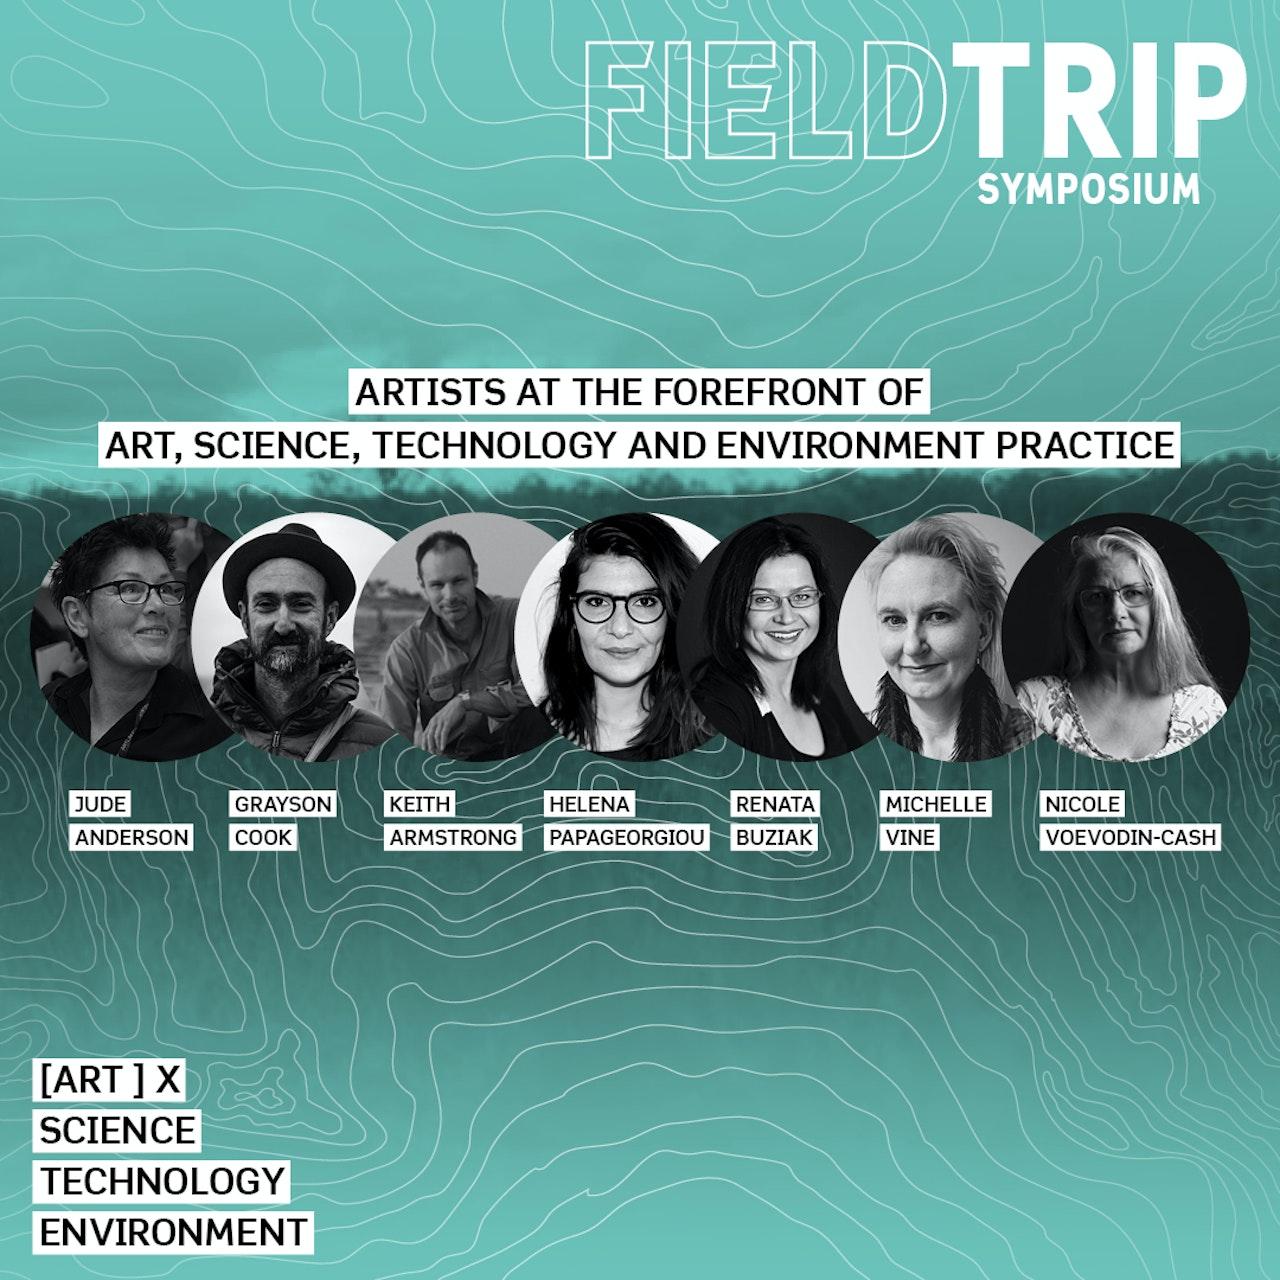 7_FieldTrip_ArtistsAtTheForefront